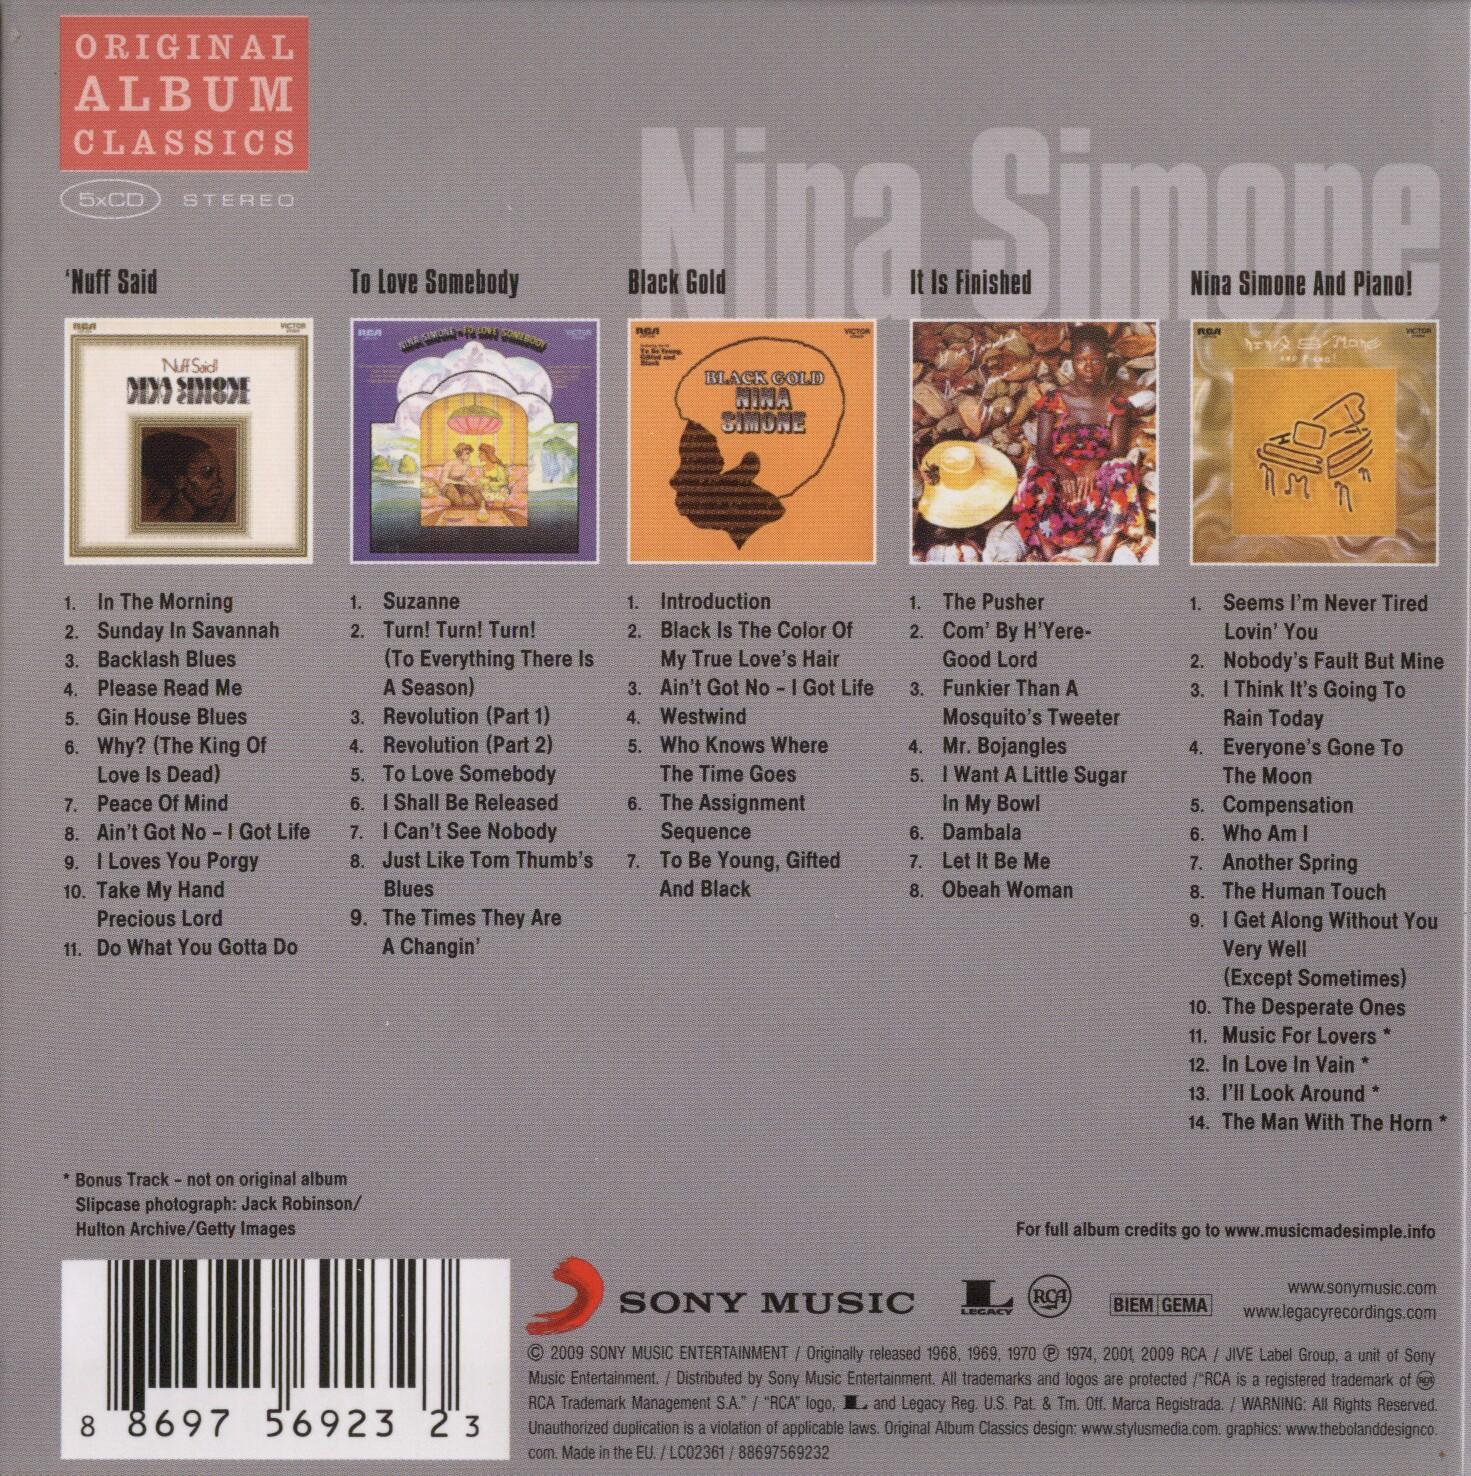 Nina Simone Original Album Classics 2009 5 Cd Box Set